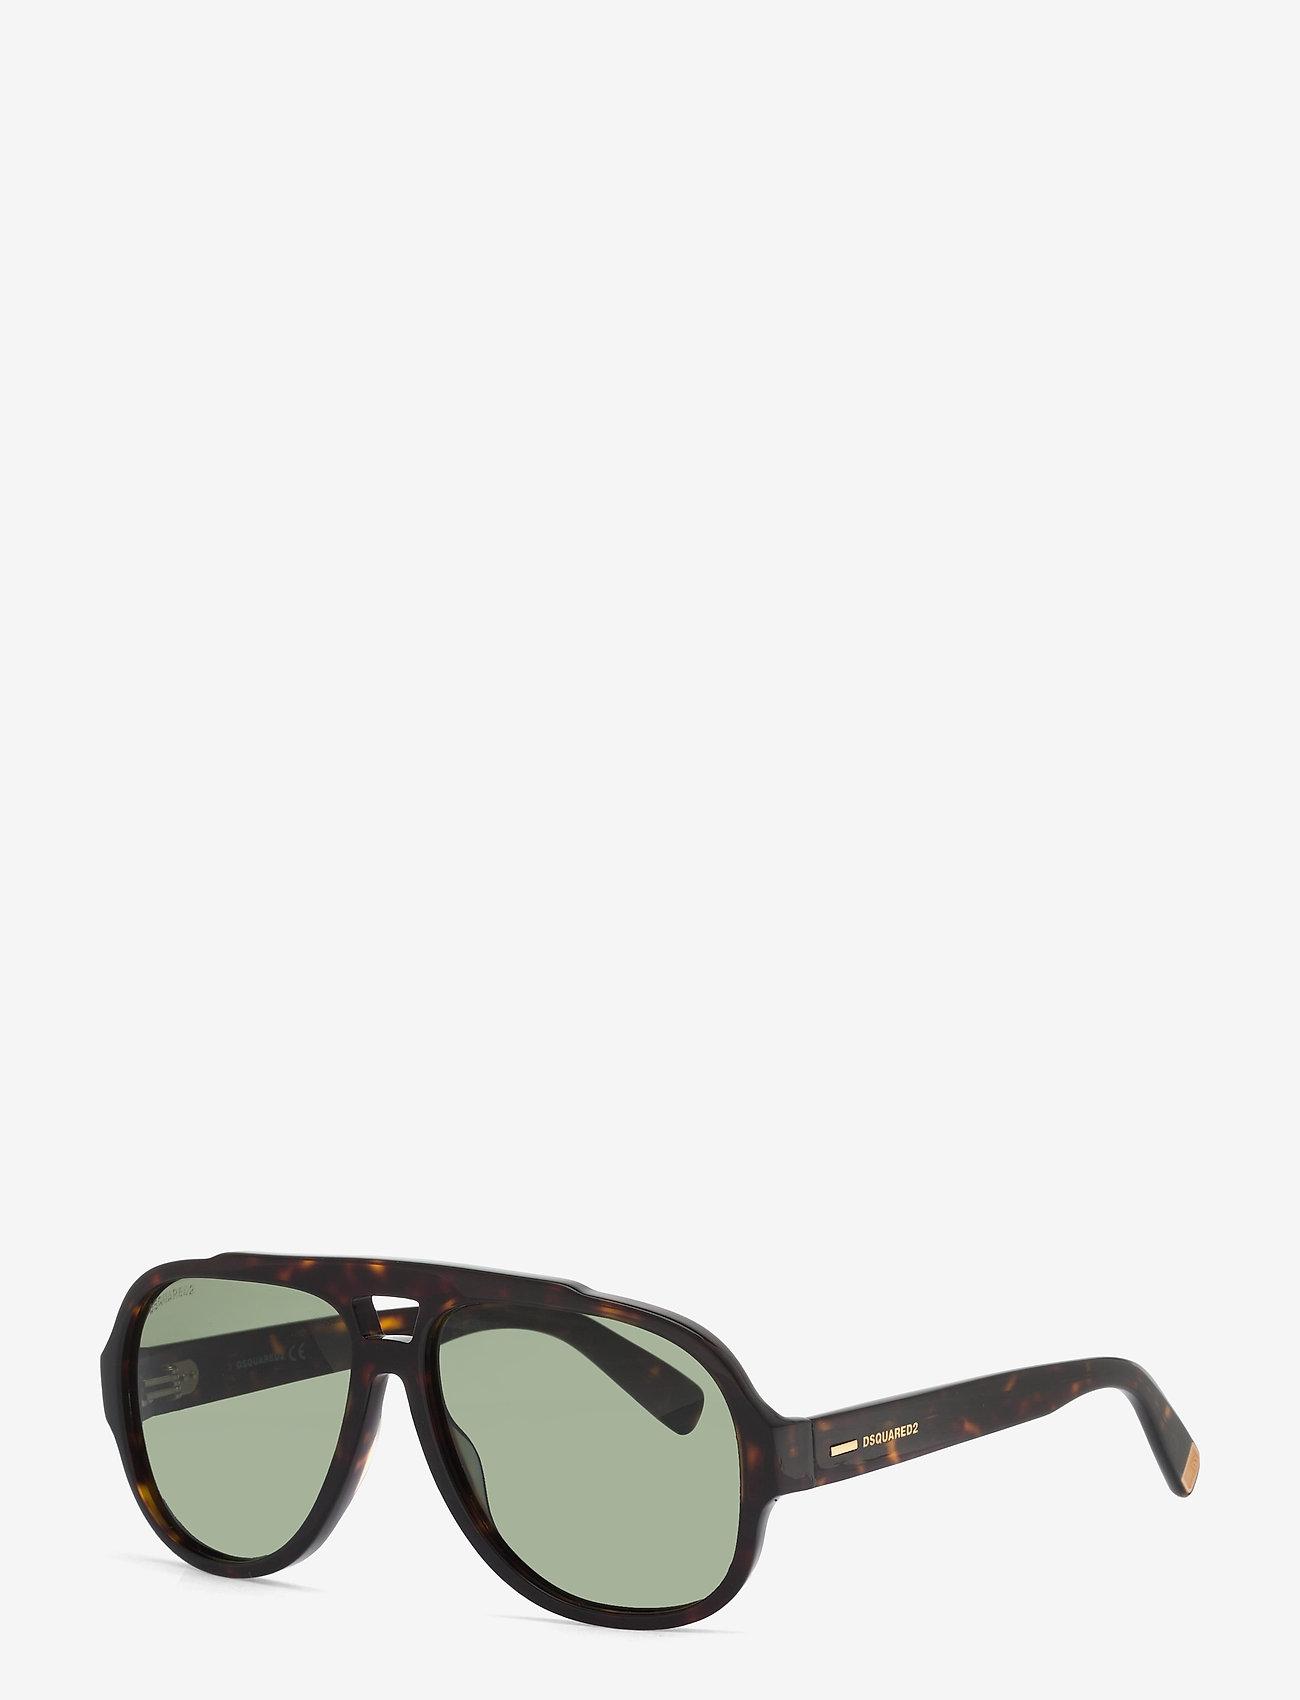 DSQUARED2 Sunglasses - Gerard - pilot - blonde havana / green - 1